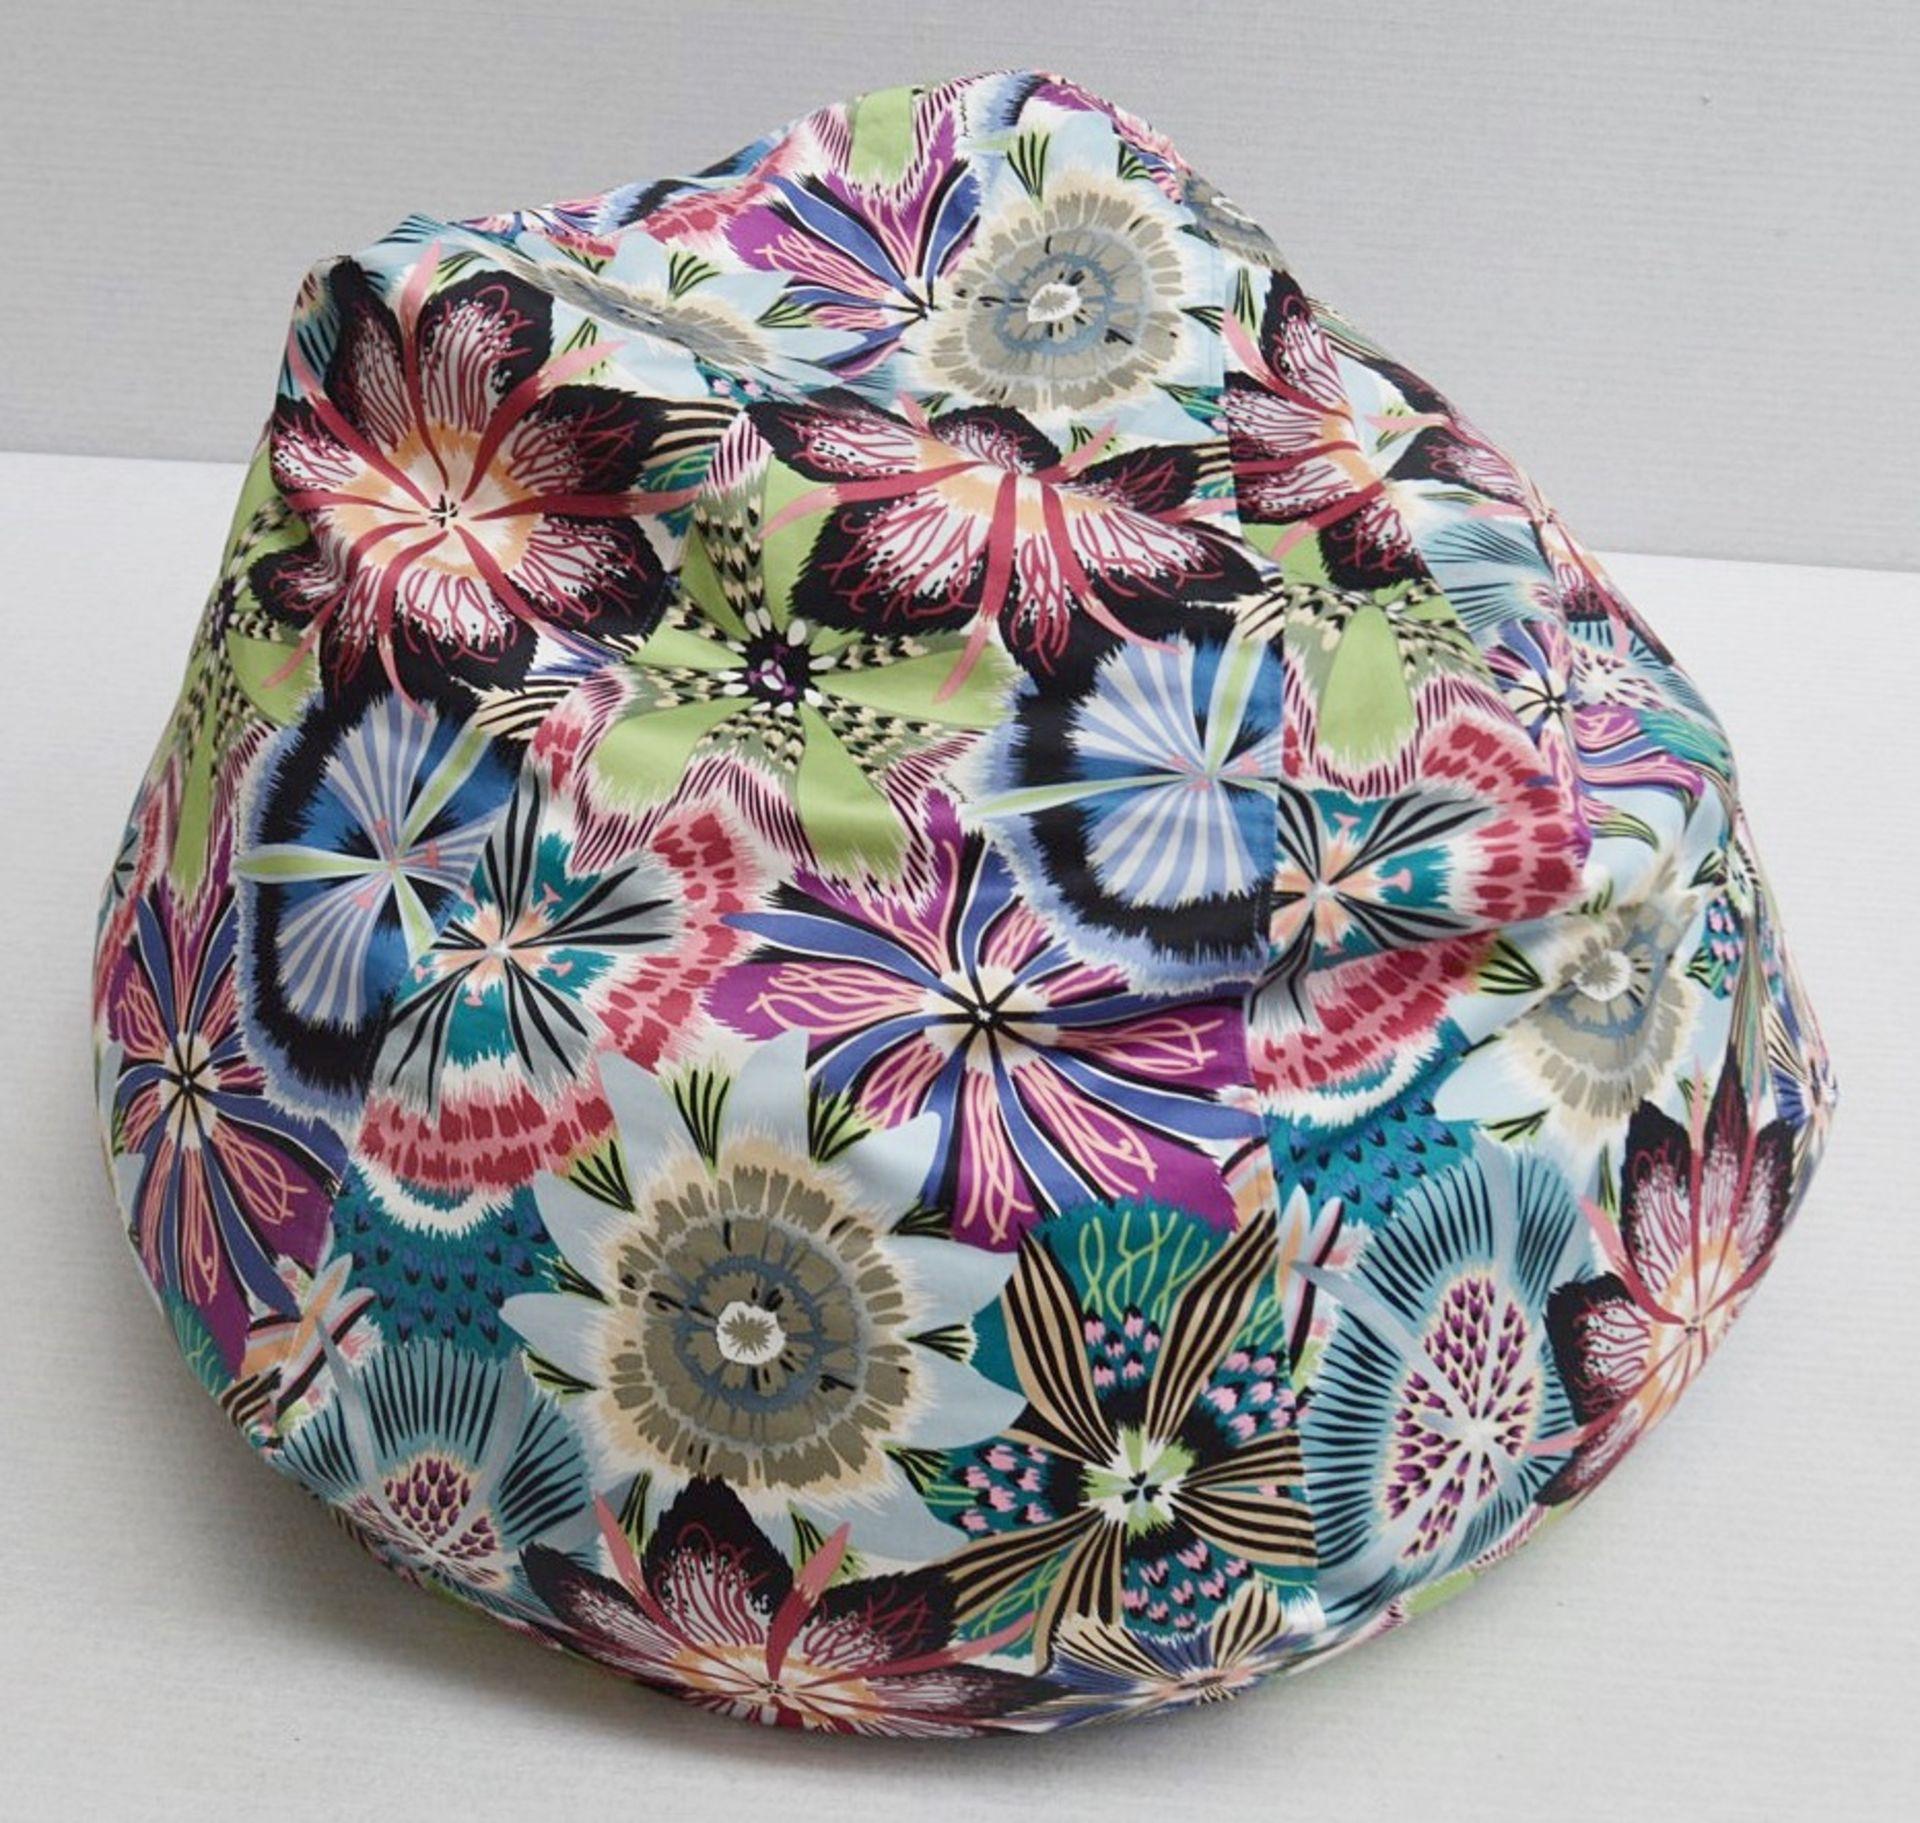 1 x Large Bean Bag Chair In 'Missoni Passiflora' Fabric - Dimensions Height 100 x Diameter 70cm